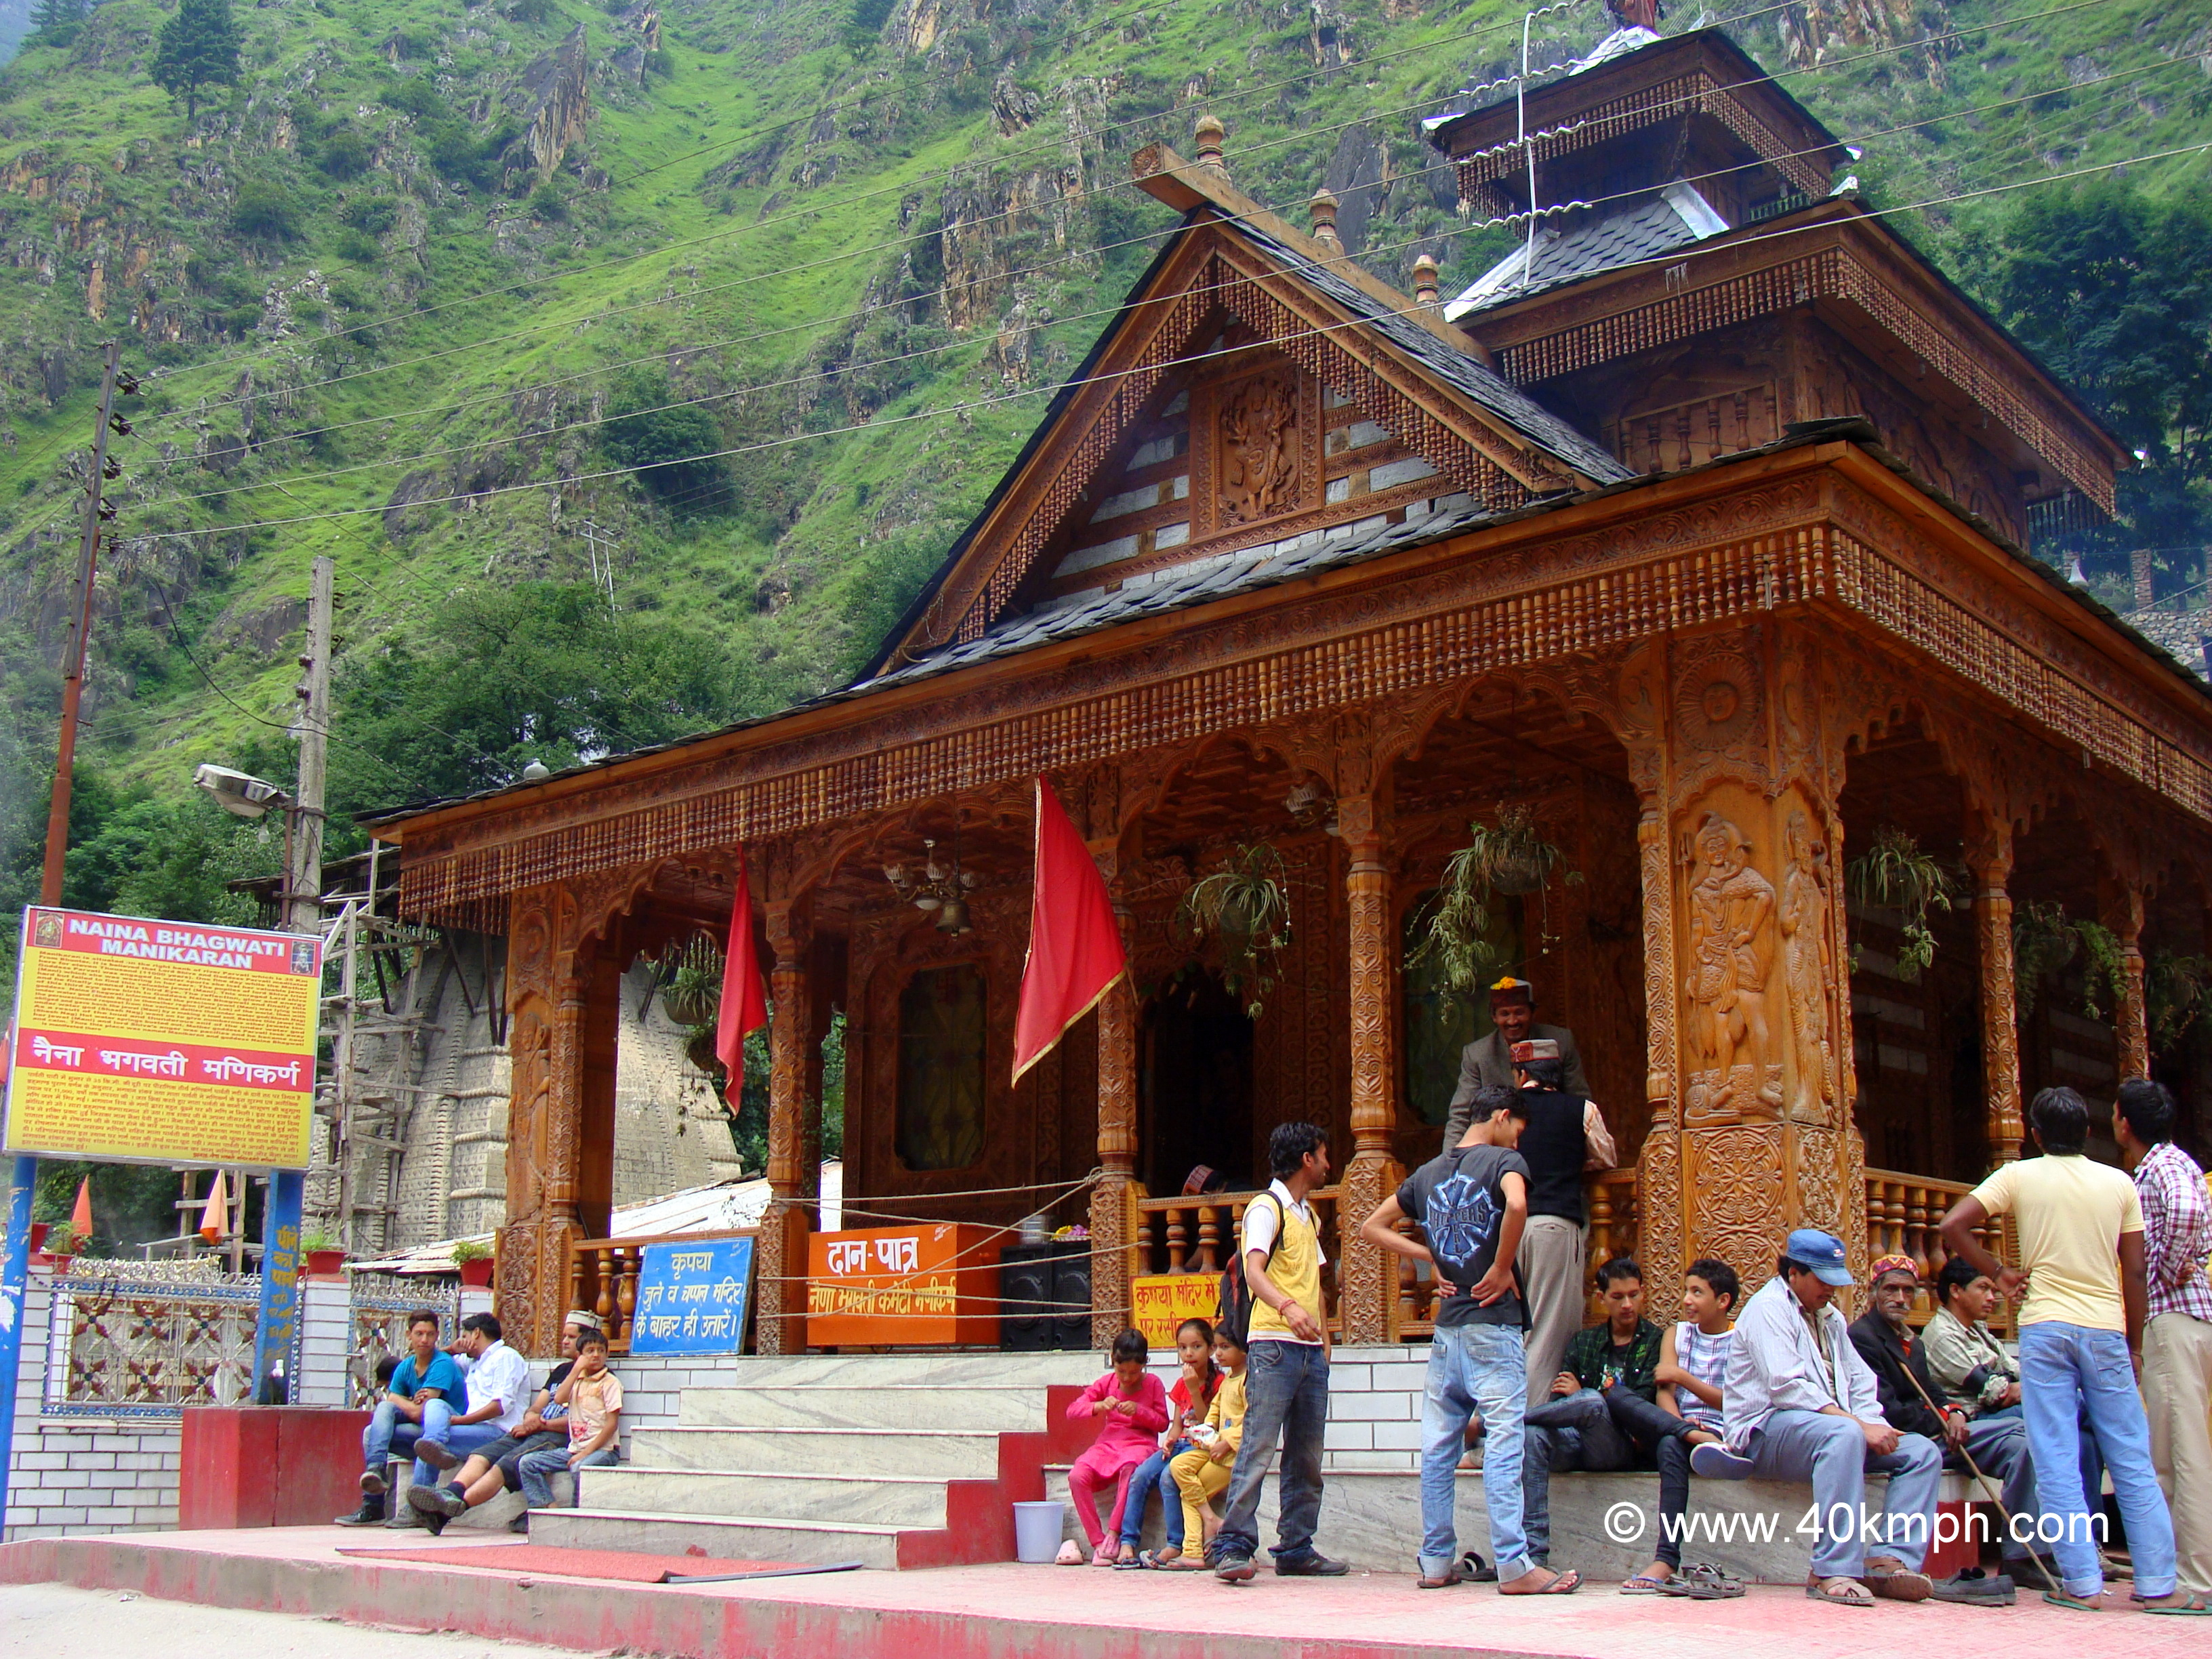 Naina Bhagwati Temple, Manikaran, Himachal Pradesh